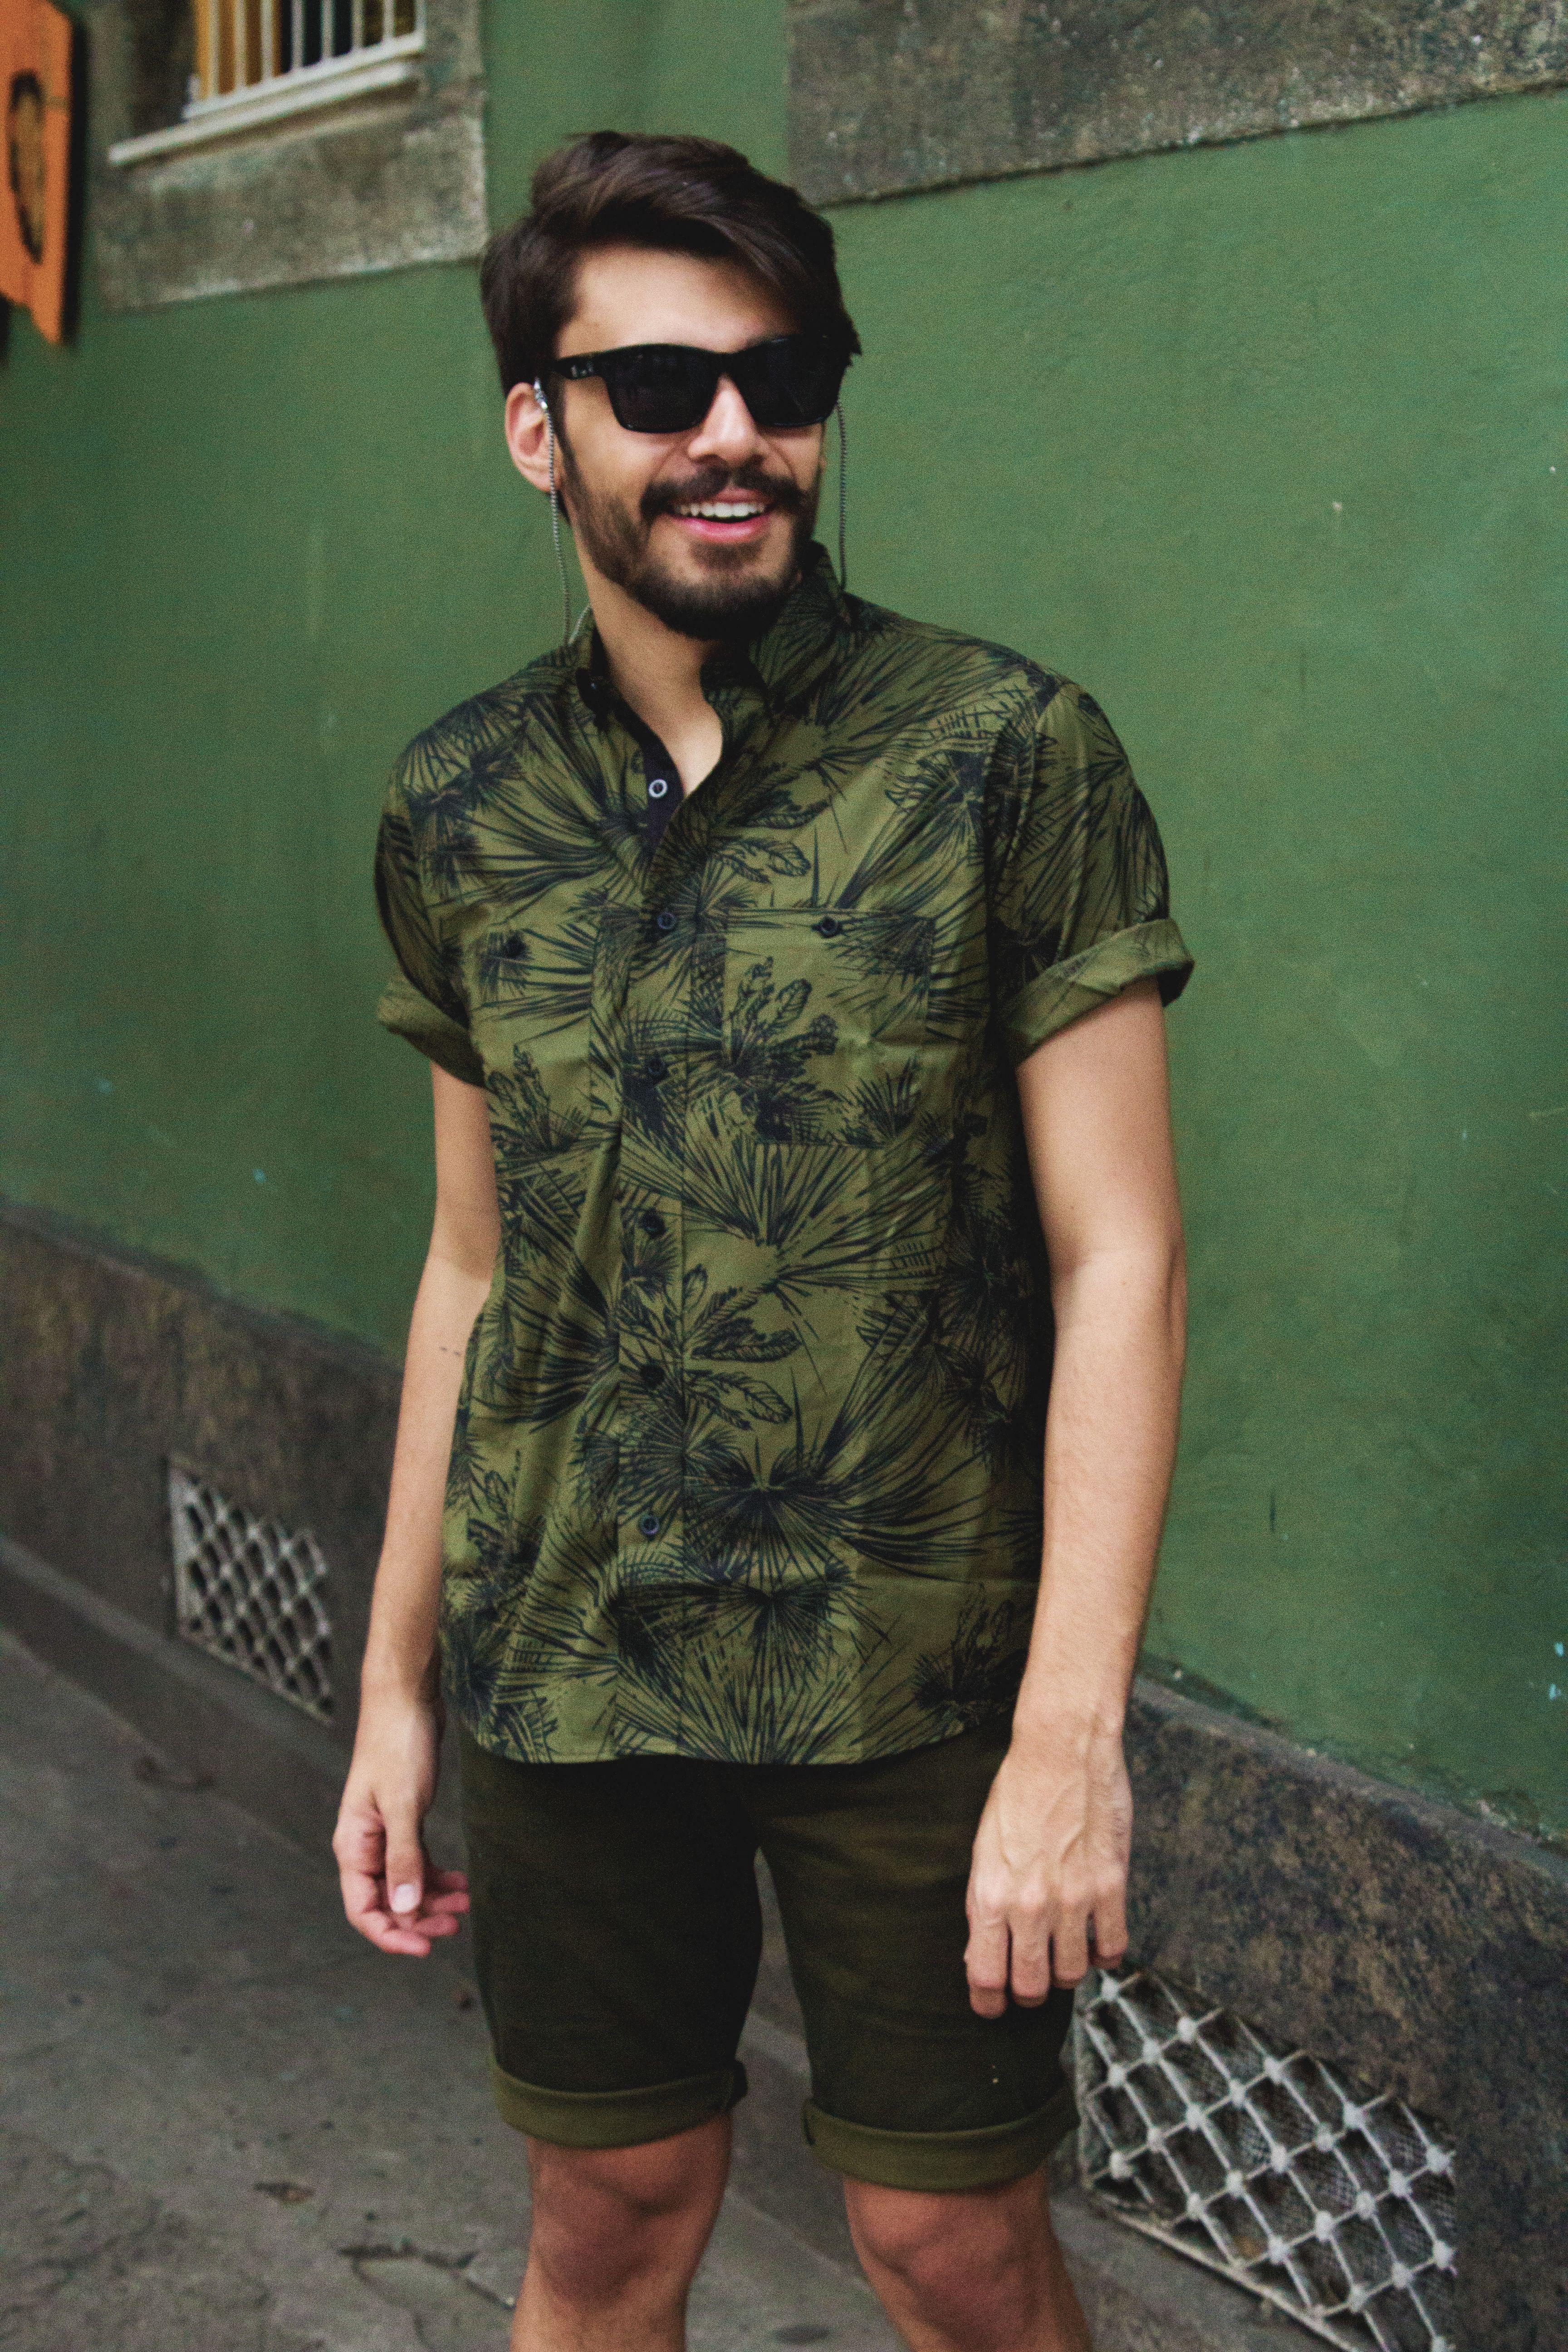 fad76b3ceb Outfit do dia  24  camisa social masculina estampada